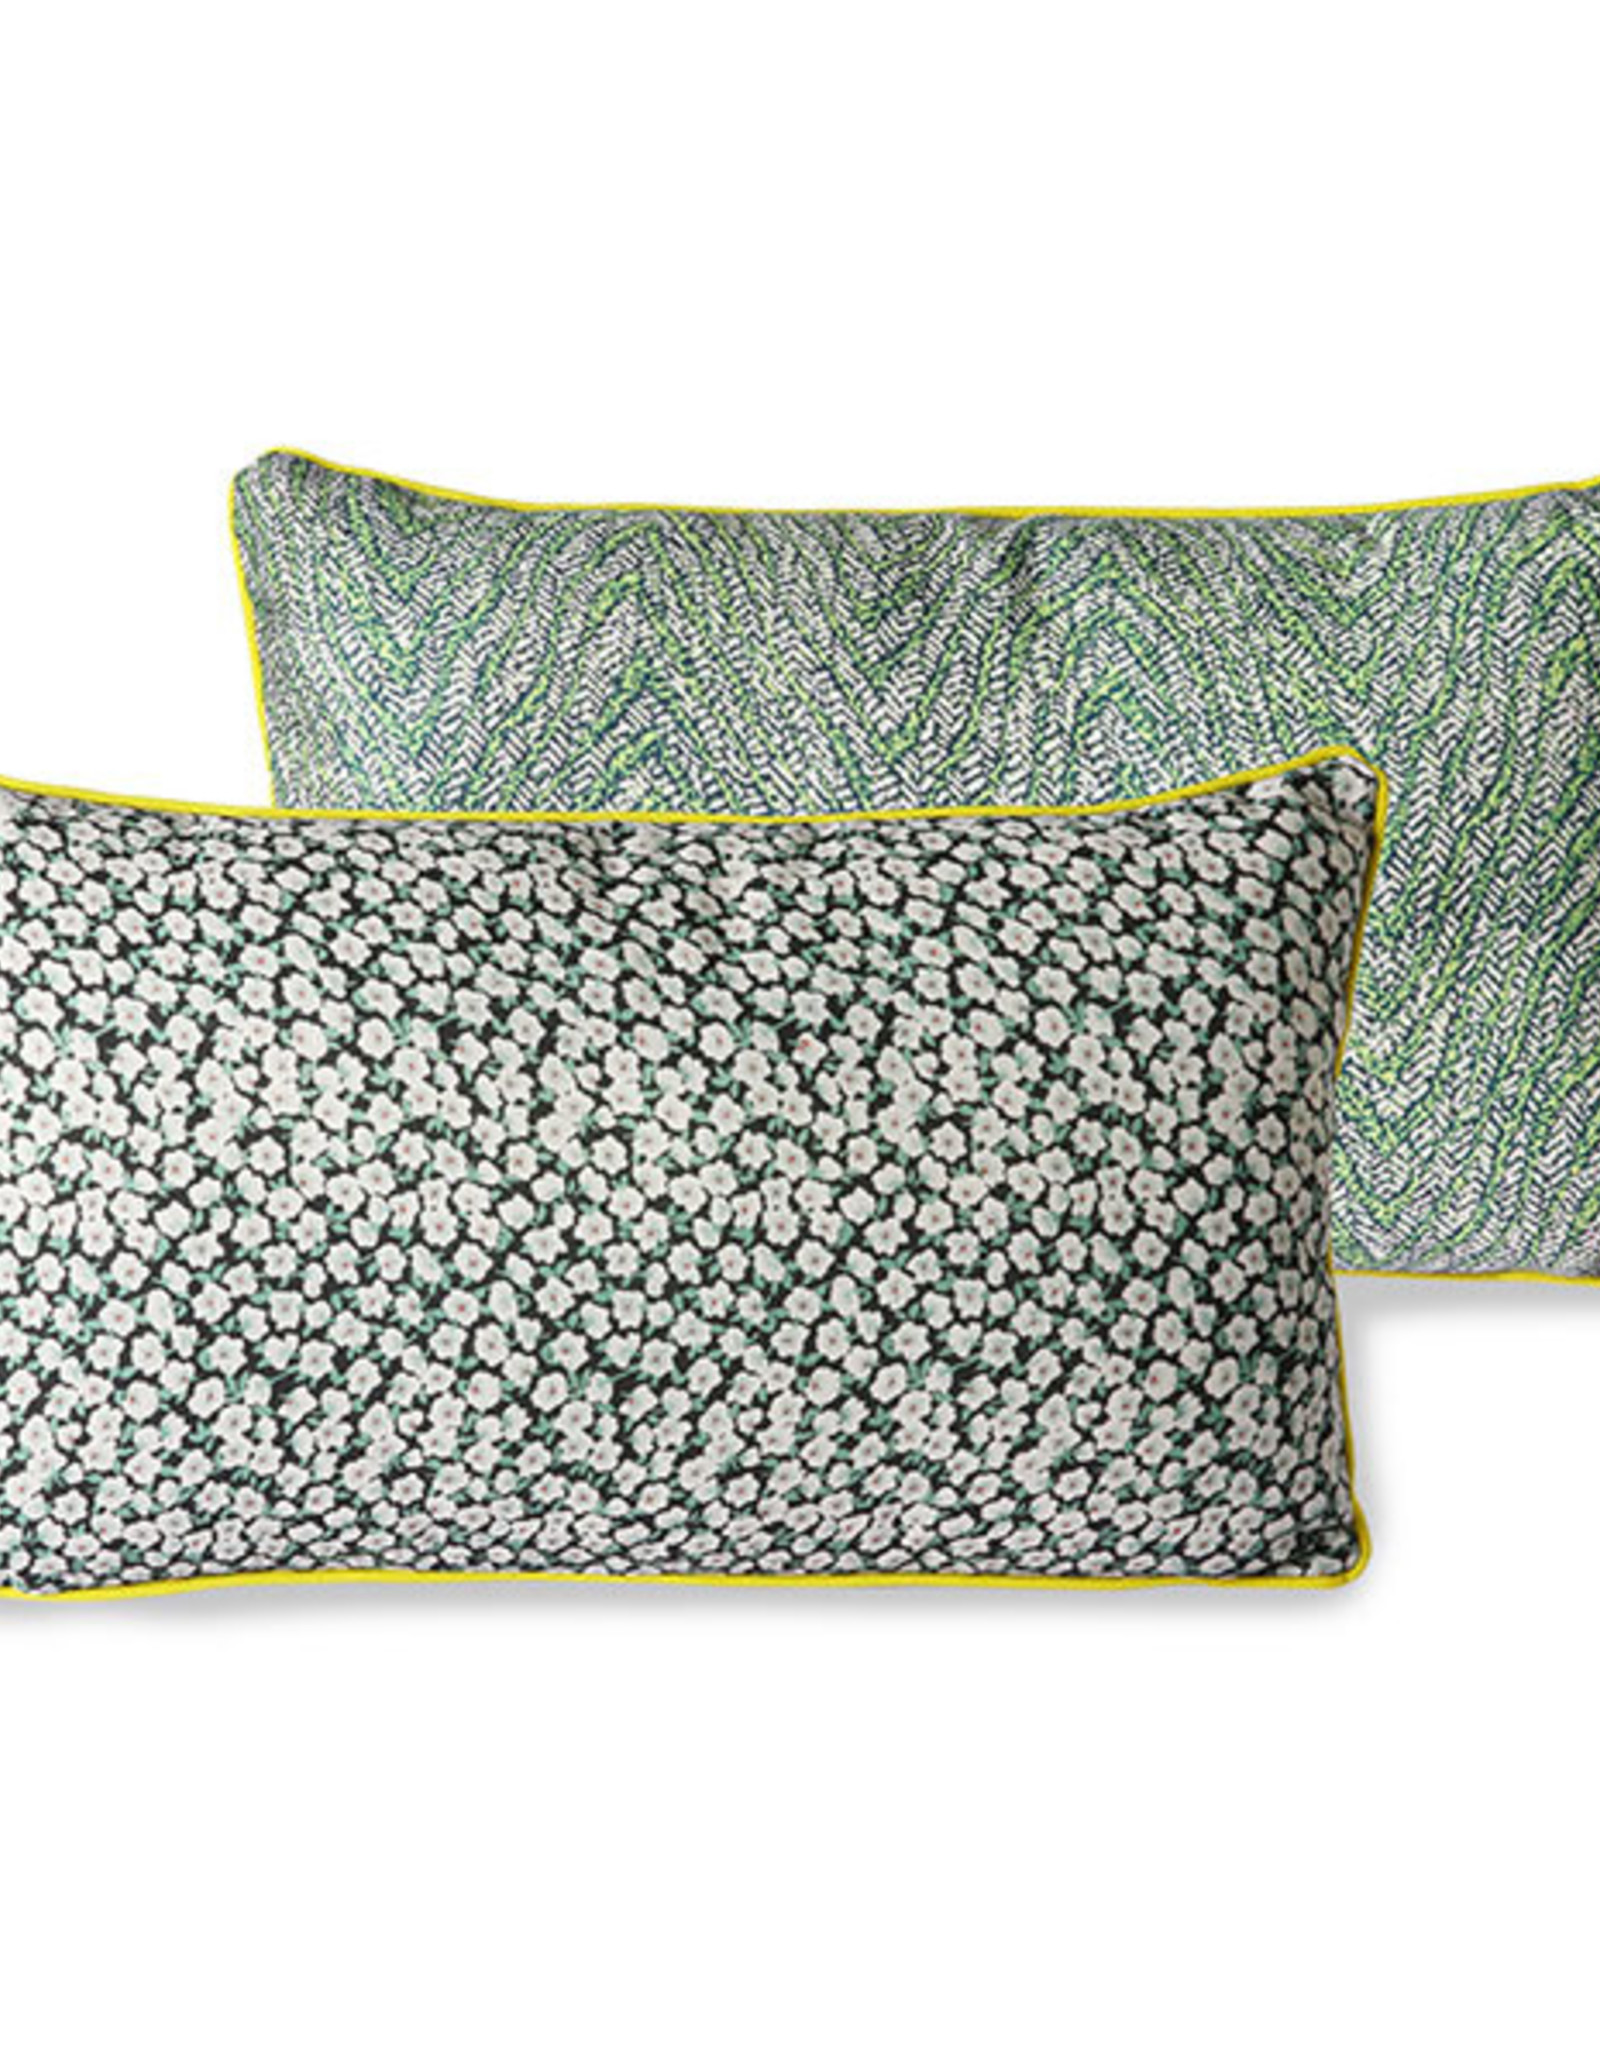 HK living Doris for HKLIVING: printed cushion green (35x60)